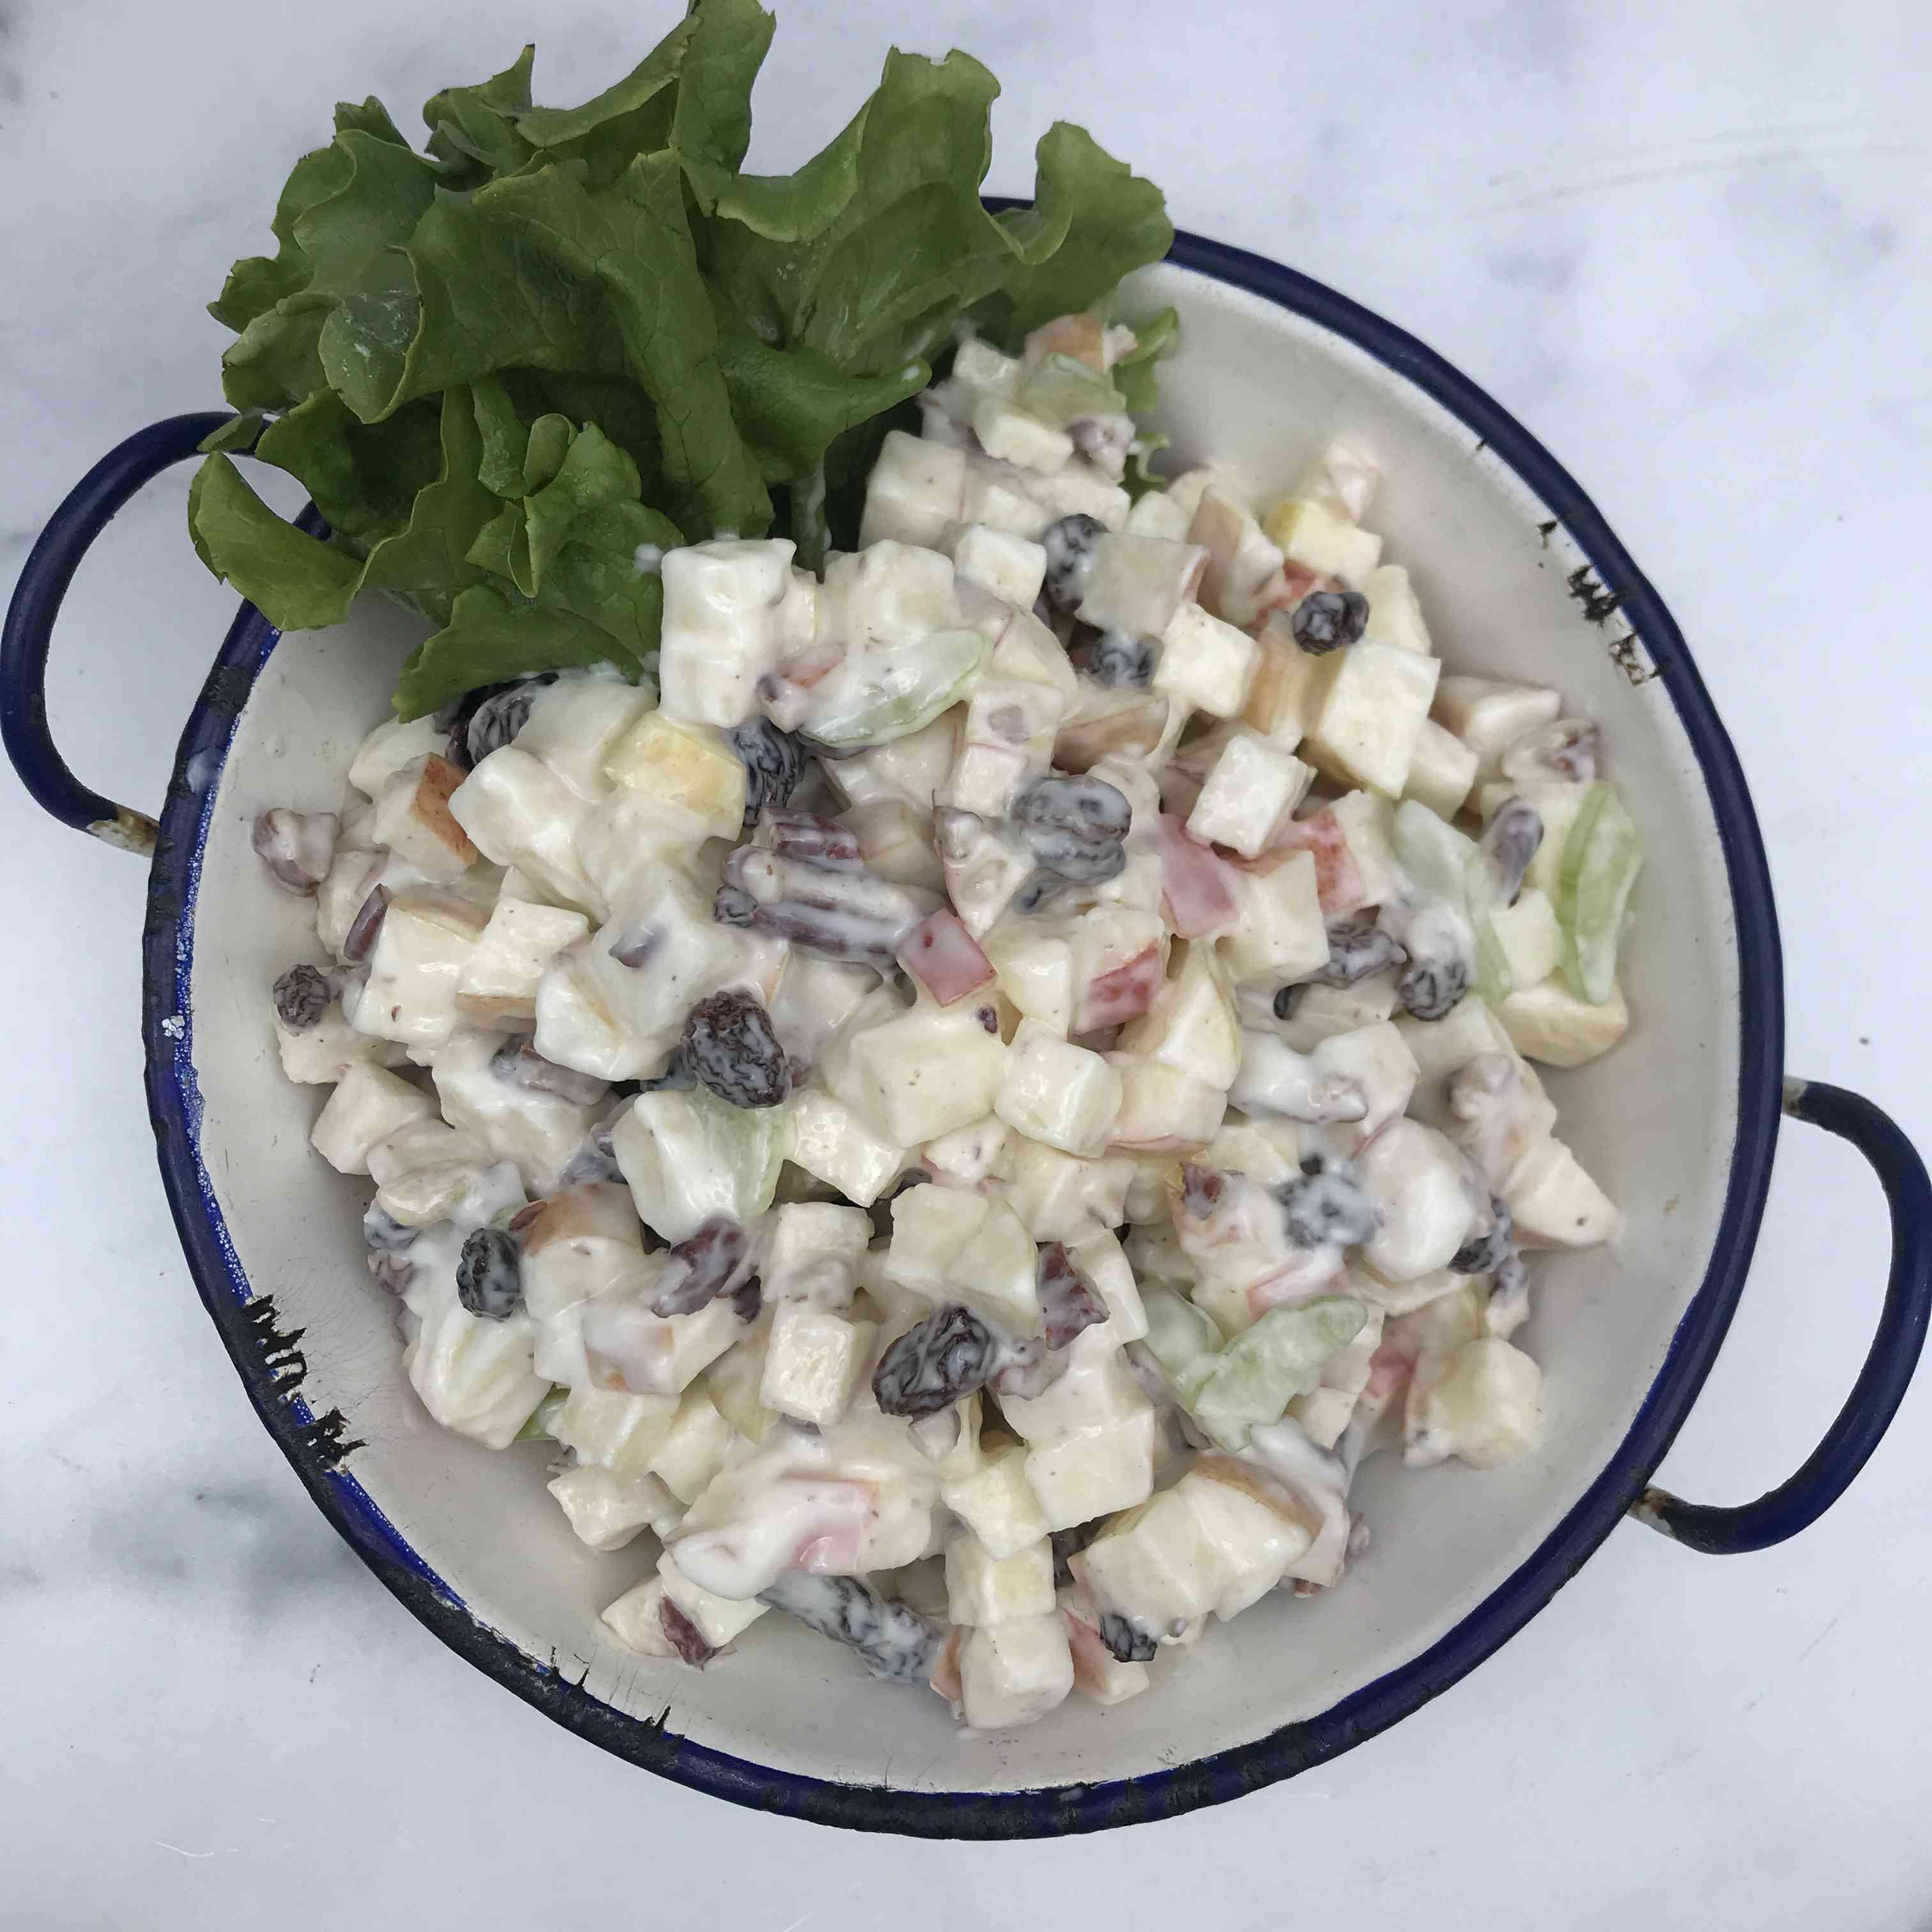 Apple Salad with Pecans and Raisins